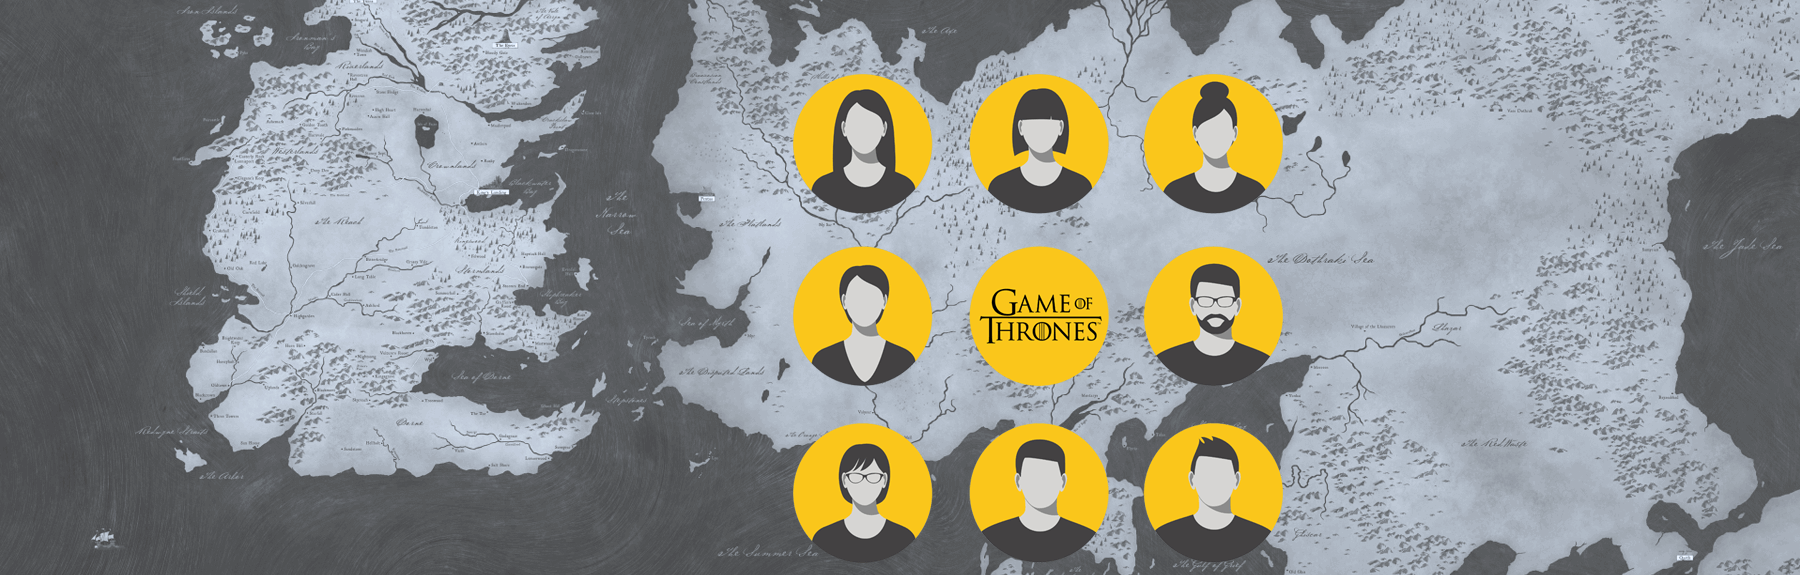 user-personas-game-of-thrones-header-1